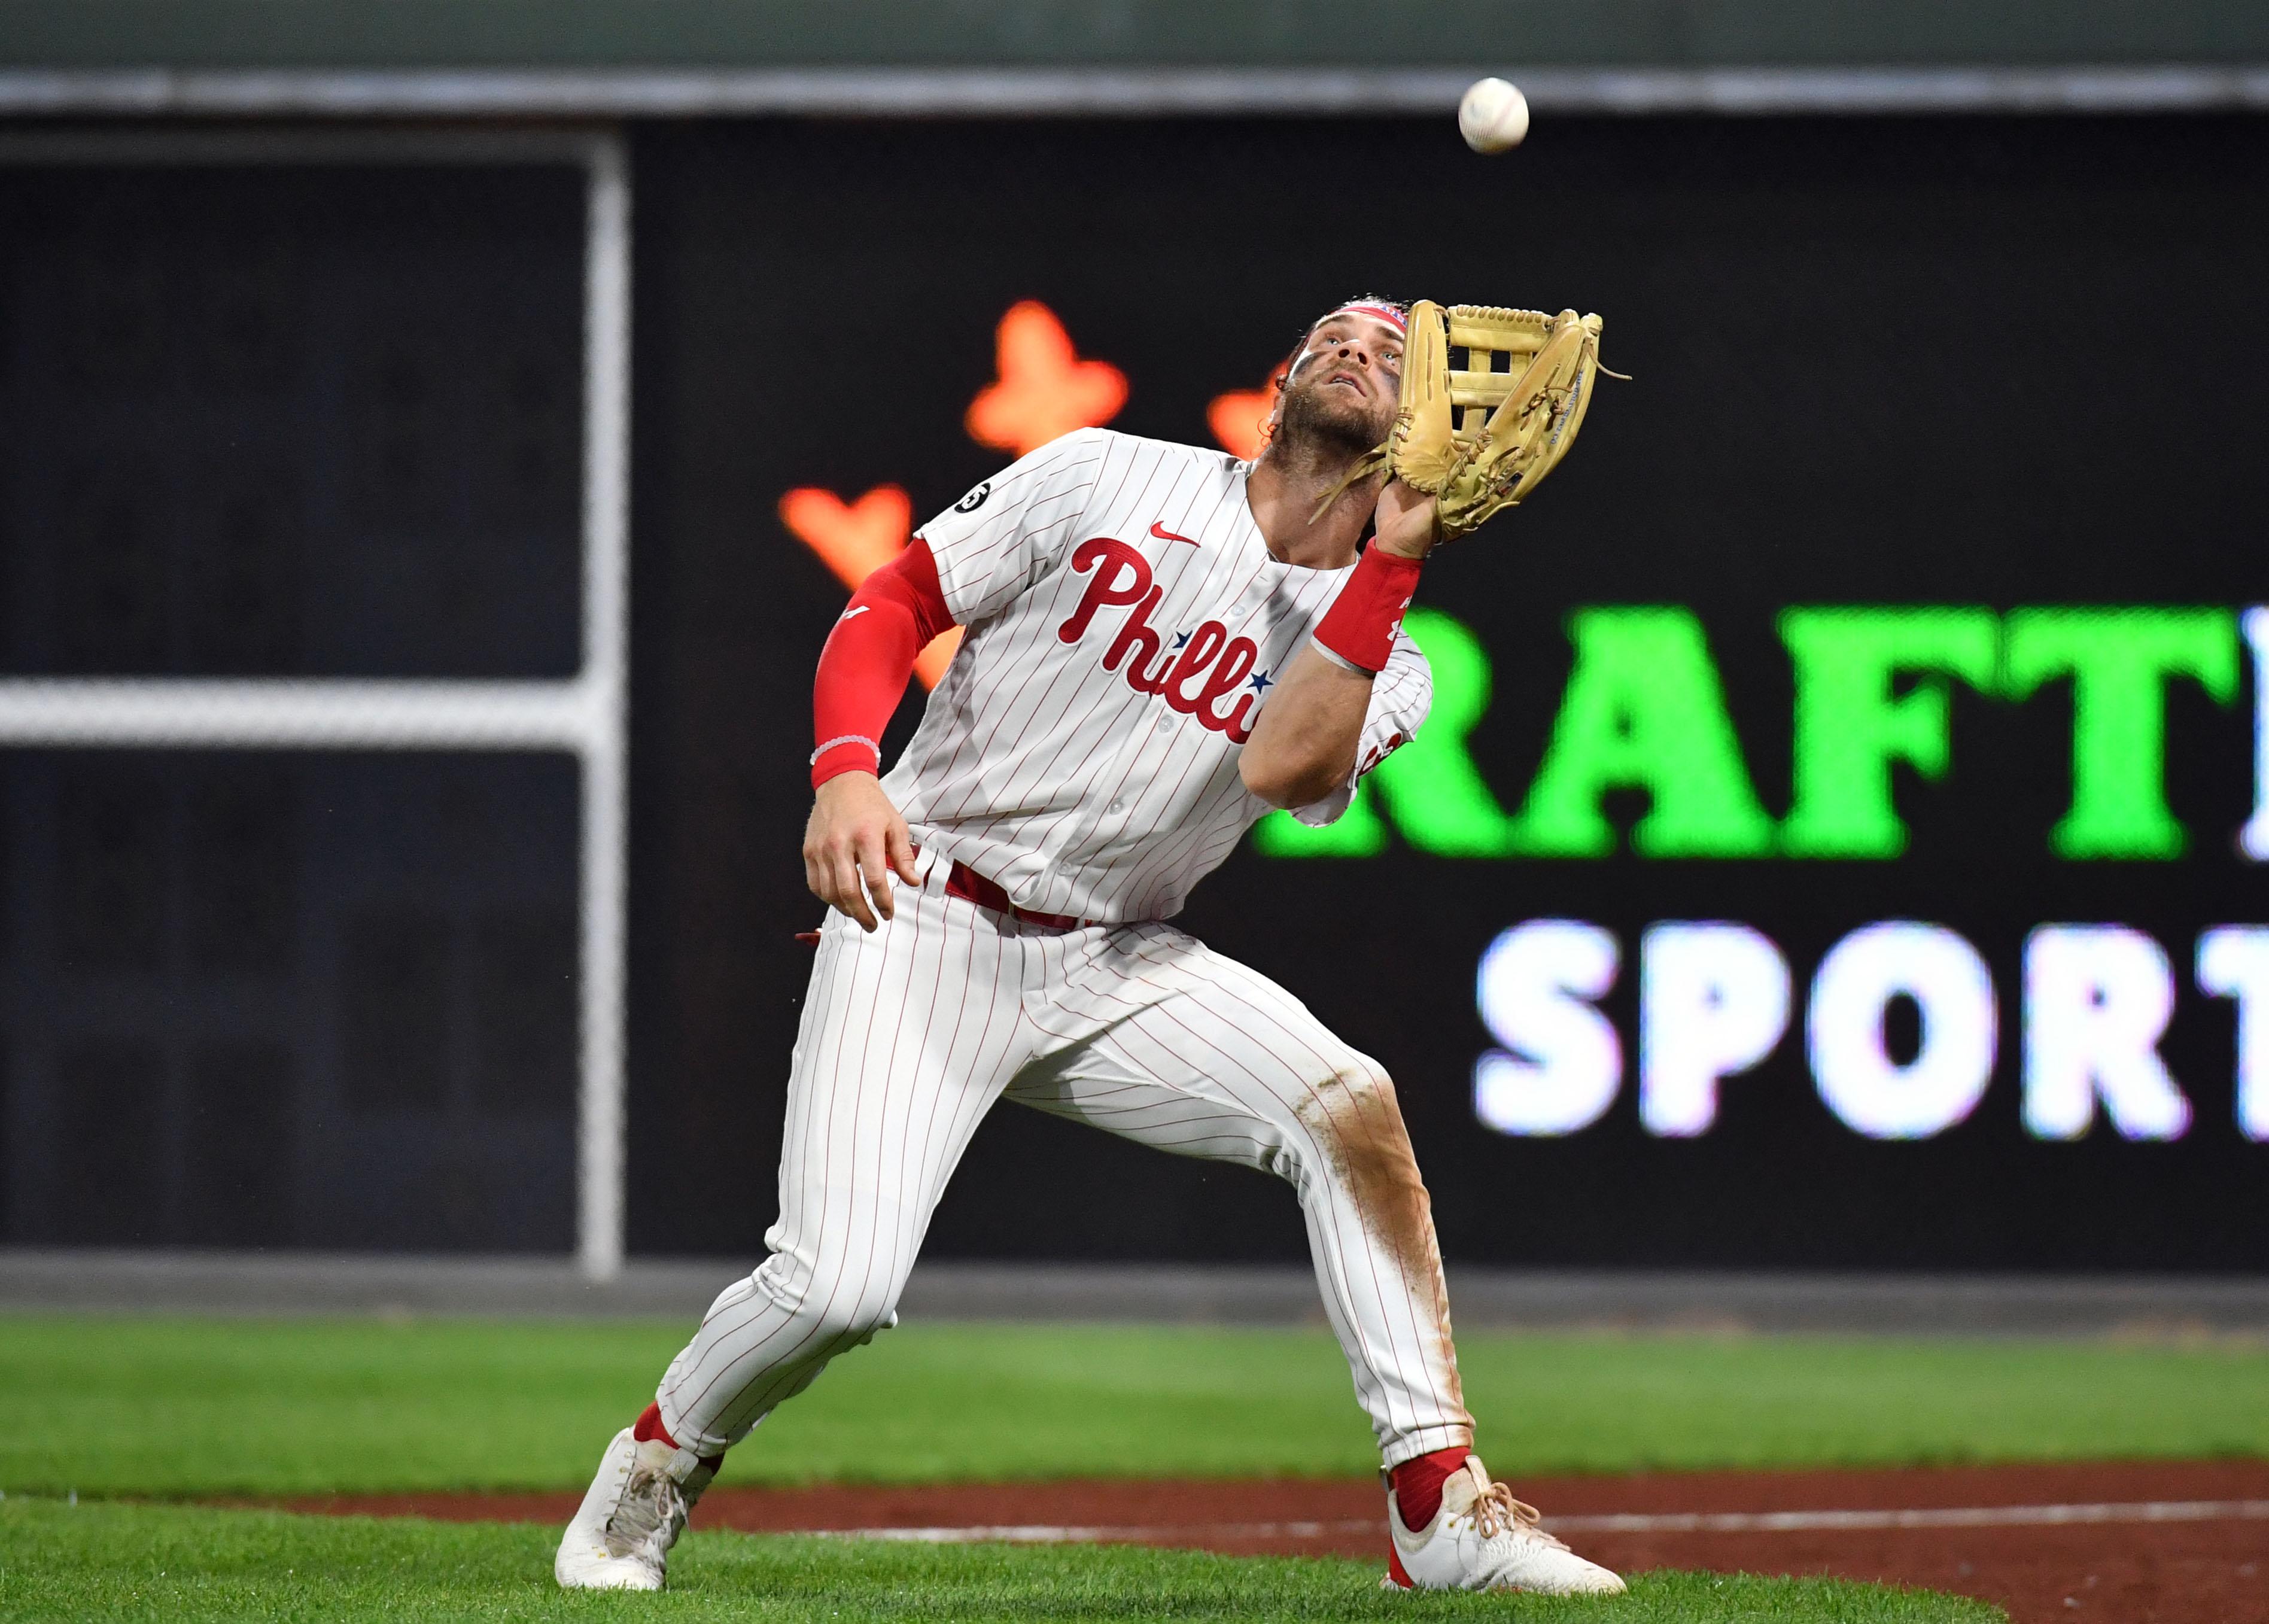 MLB: Chicago Cubs at Philadelphia Phillies